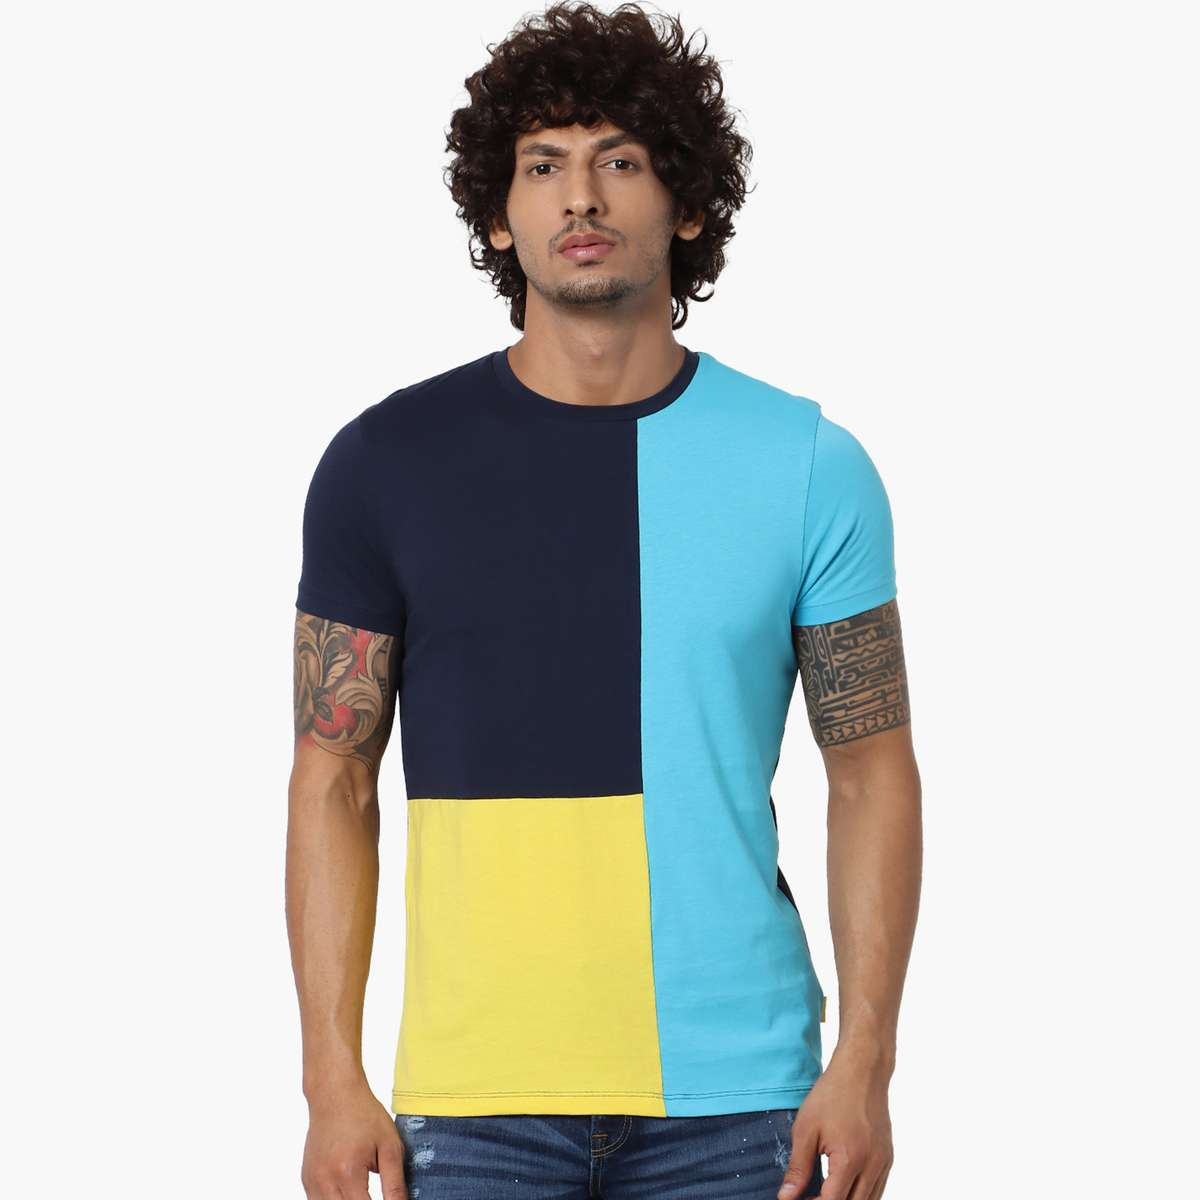 7.JACK & JONES Men Colourblock Regular Fit Crew Neck T-shirt